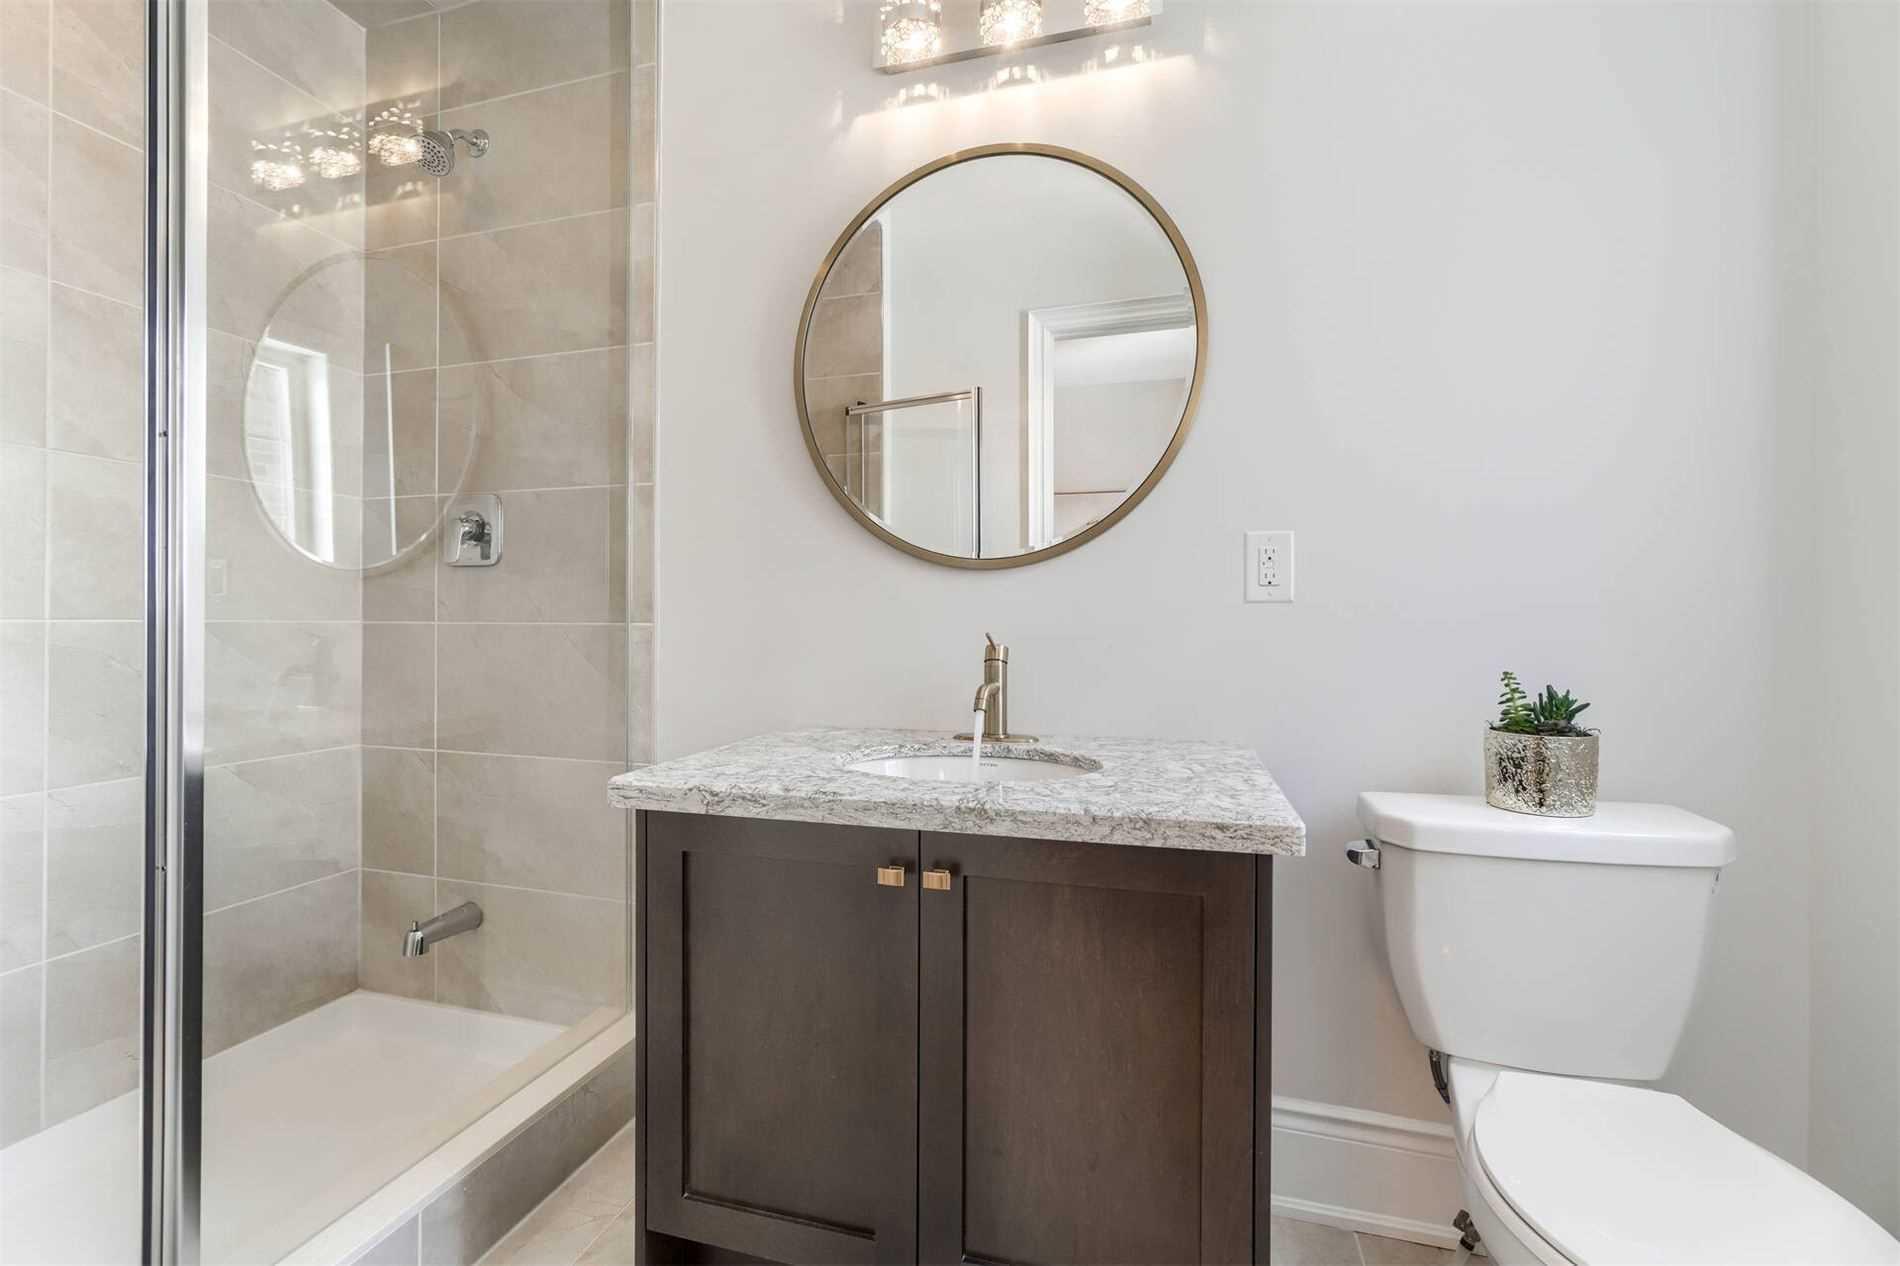 29 Chiming Rd, Brampton, Ontario L6P4E1, 5 Bedrooms Bedrooms, 12 Rooms Rooms,5 BathroomsBathrooms,Detached,For Sale,Chiming,W5124686